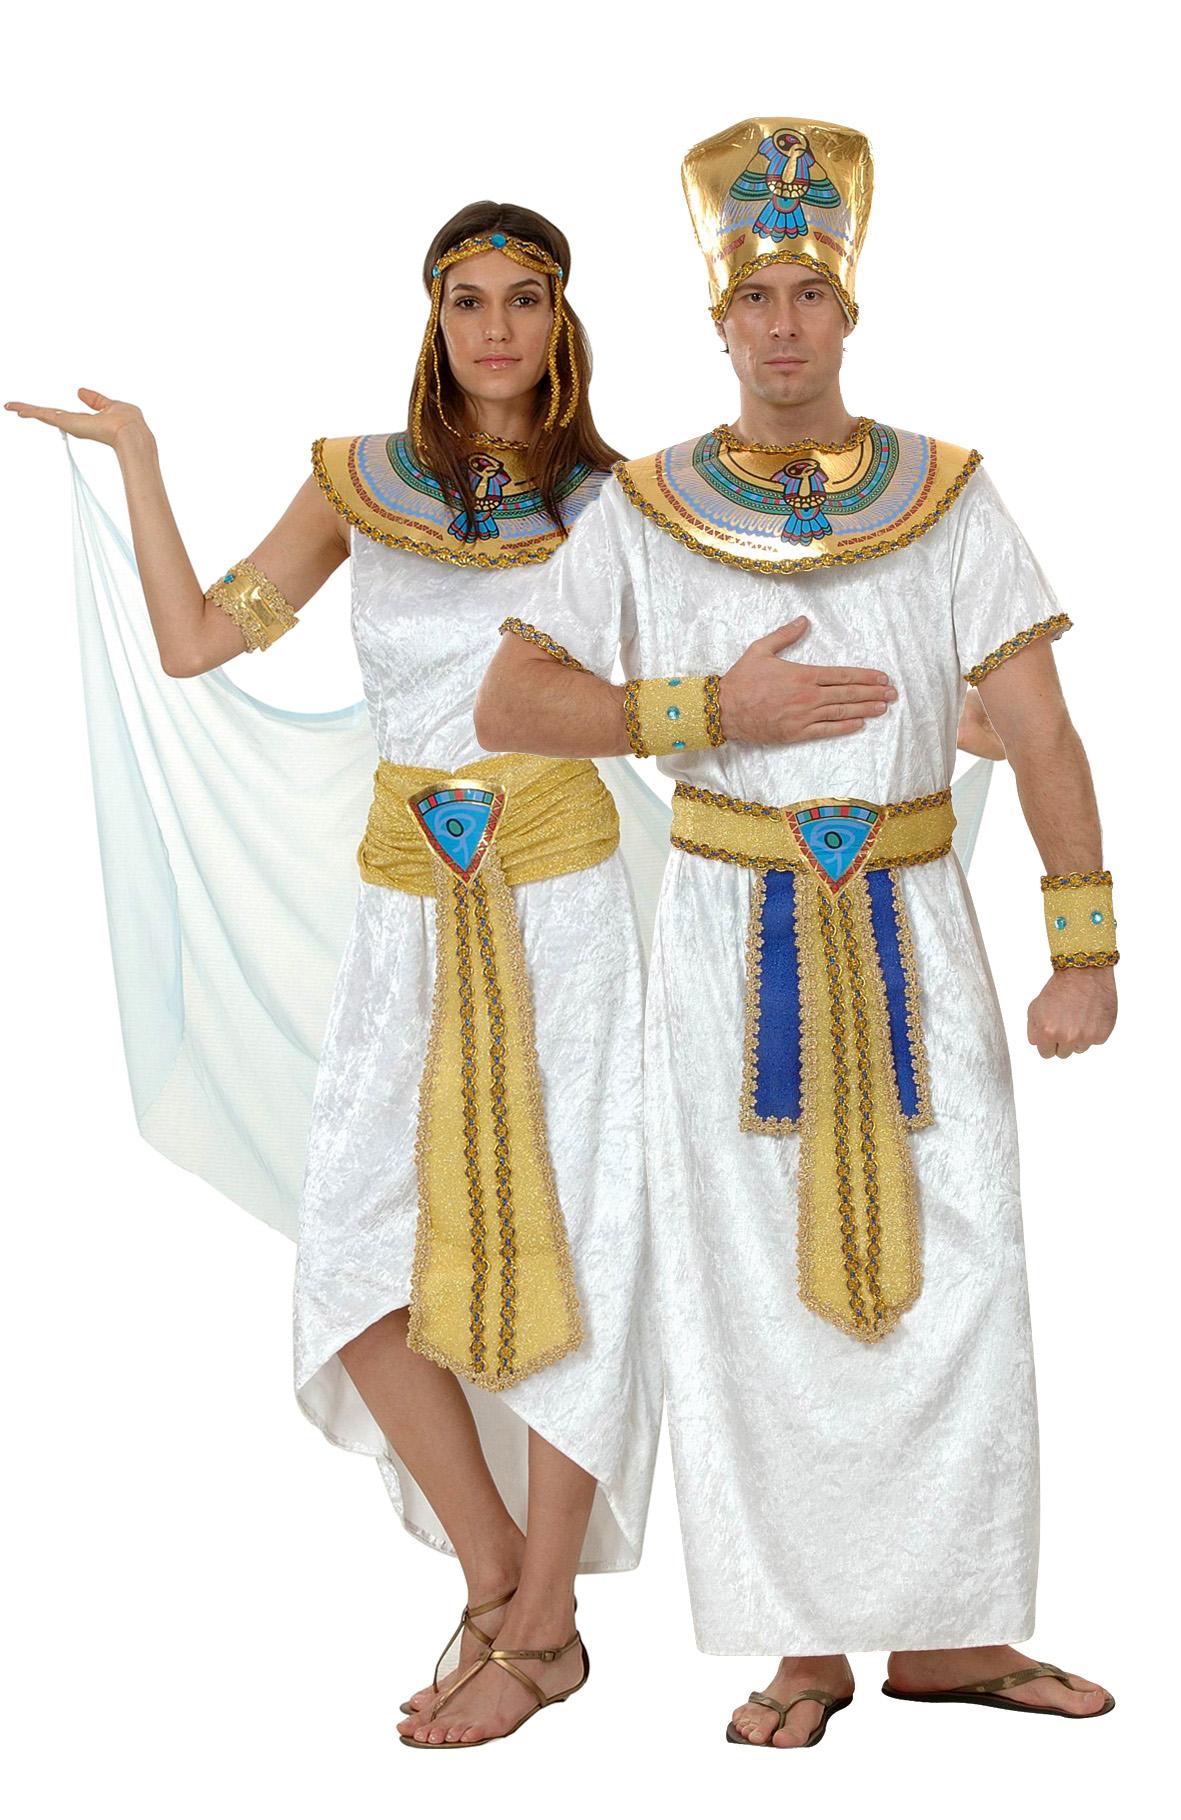 Королева Египта и фараон - костюмы для пар